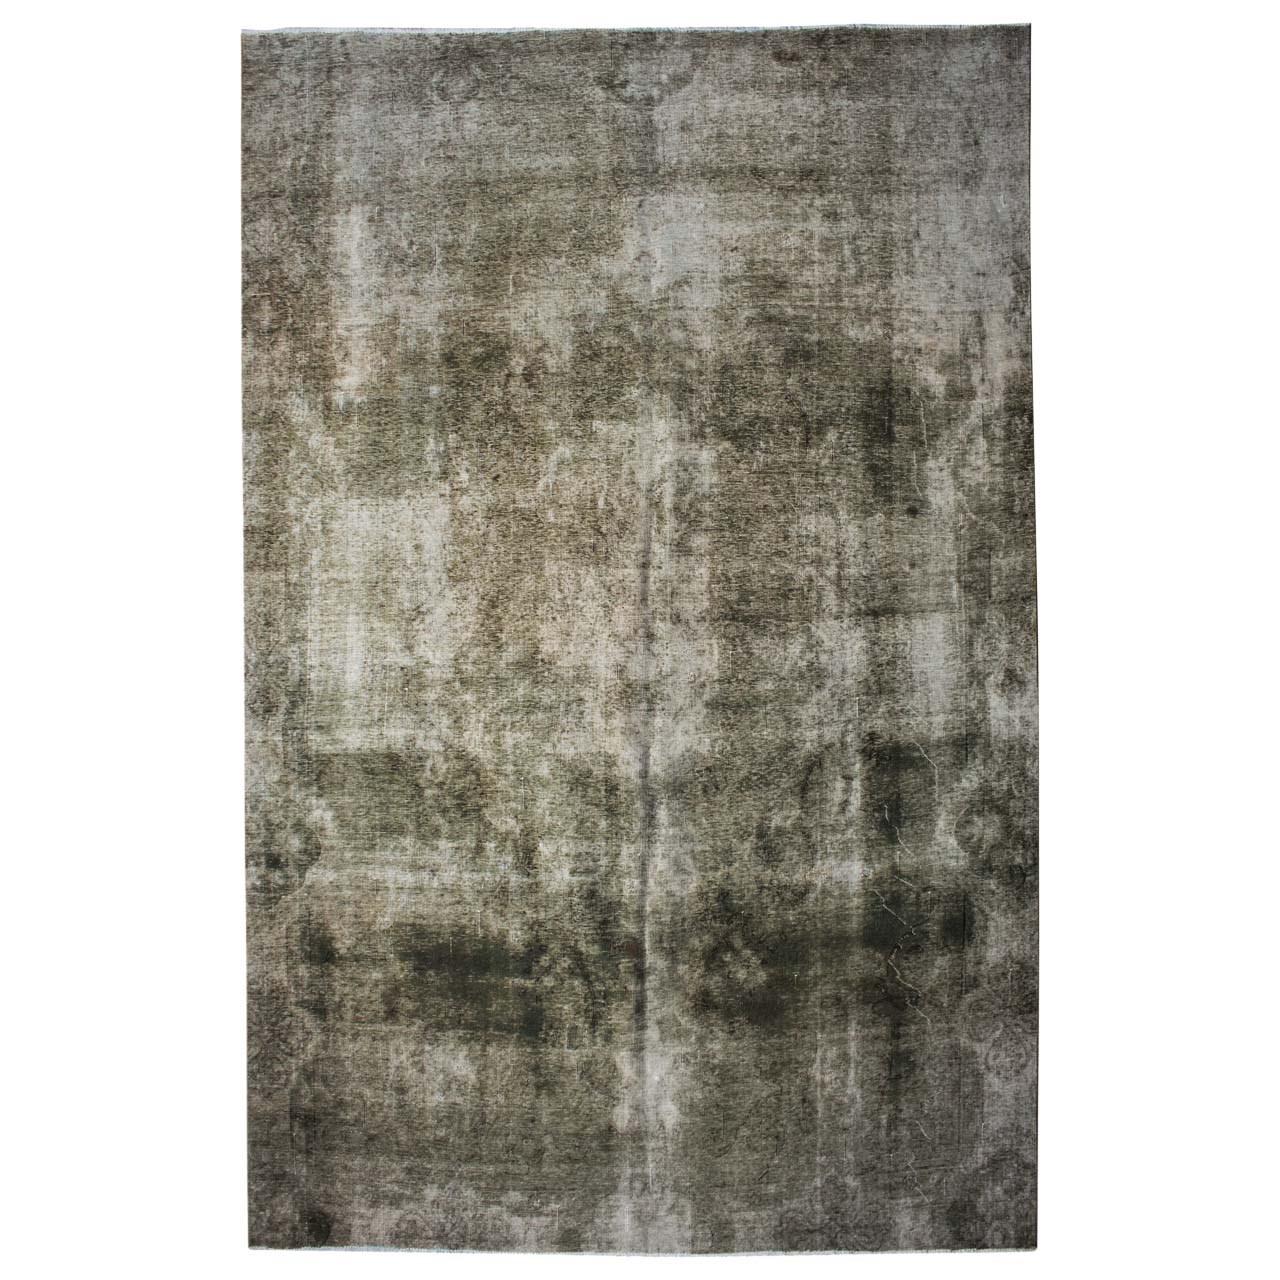 فرش قدیمی 8 متری سرزمین فرش کد cp2156